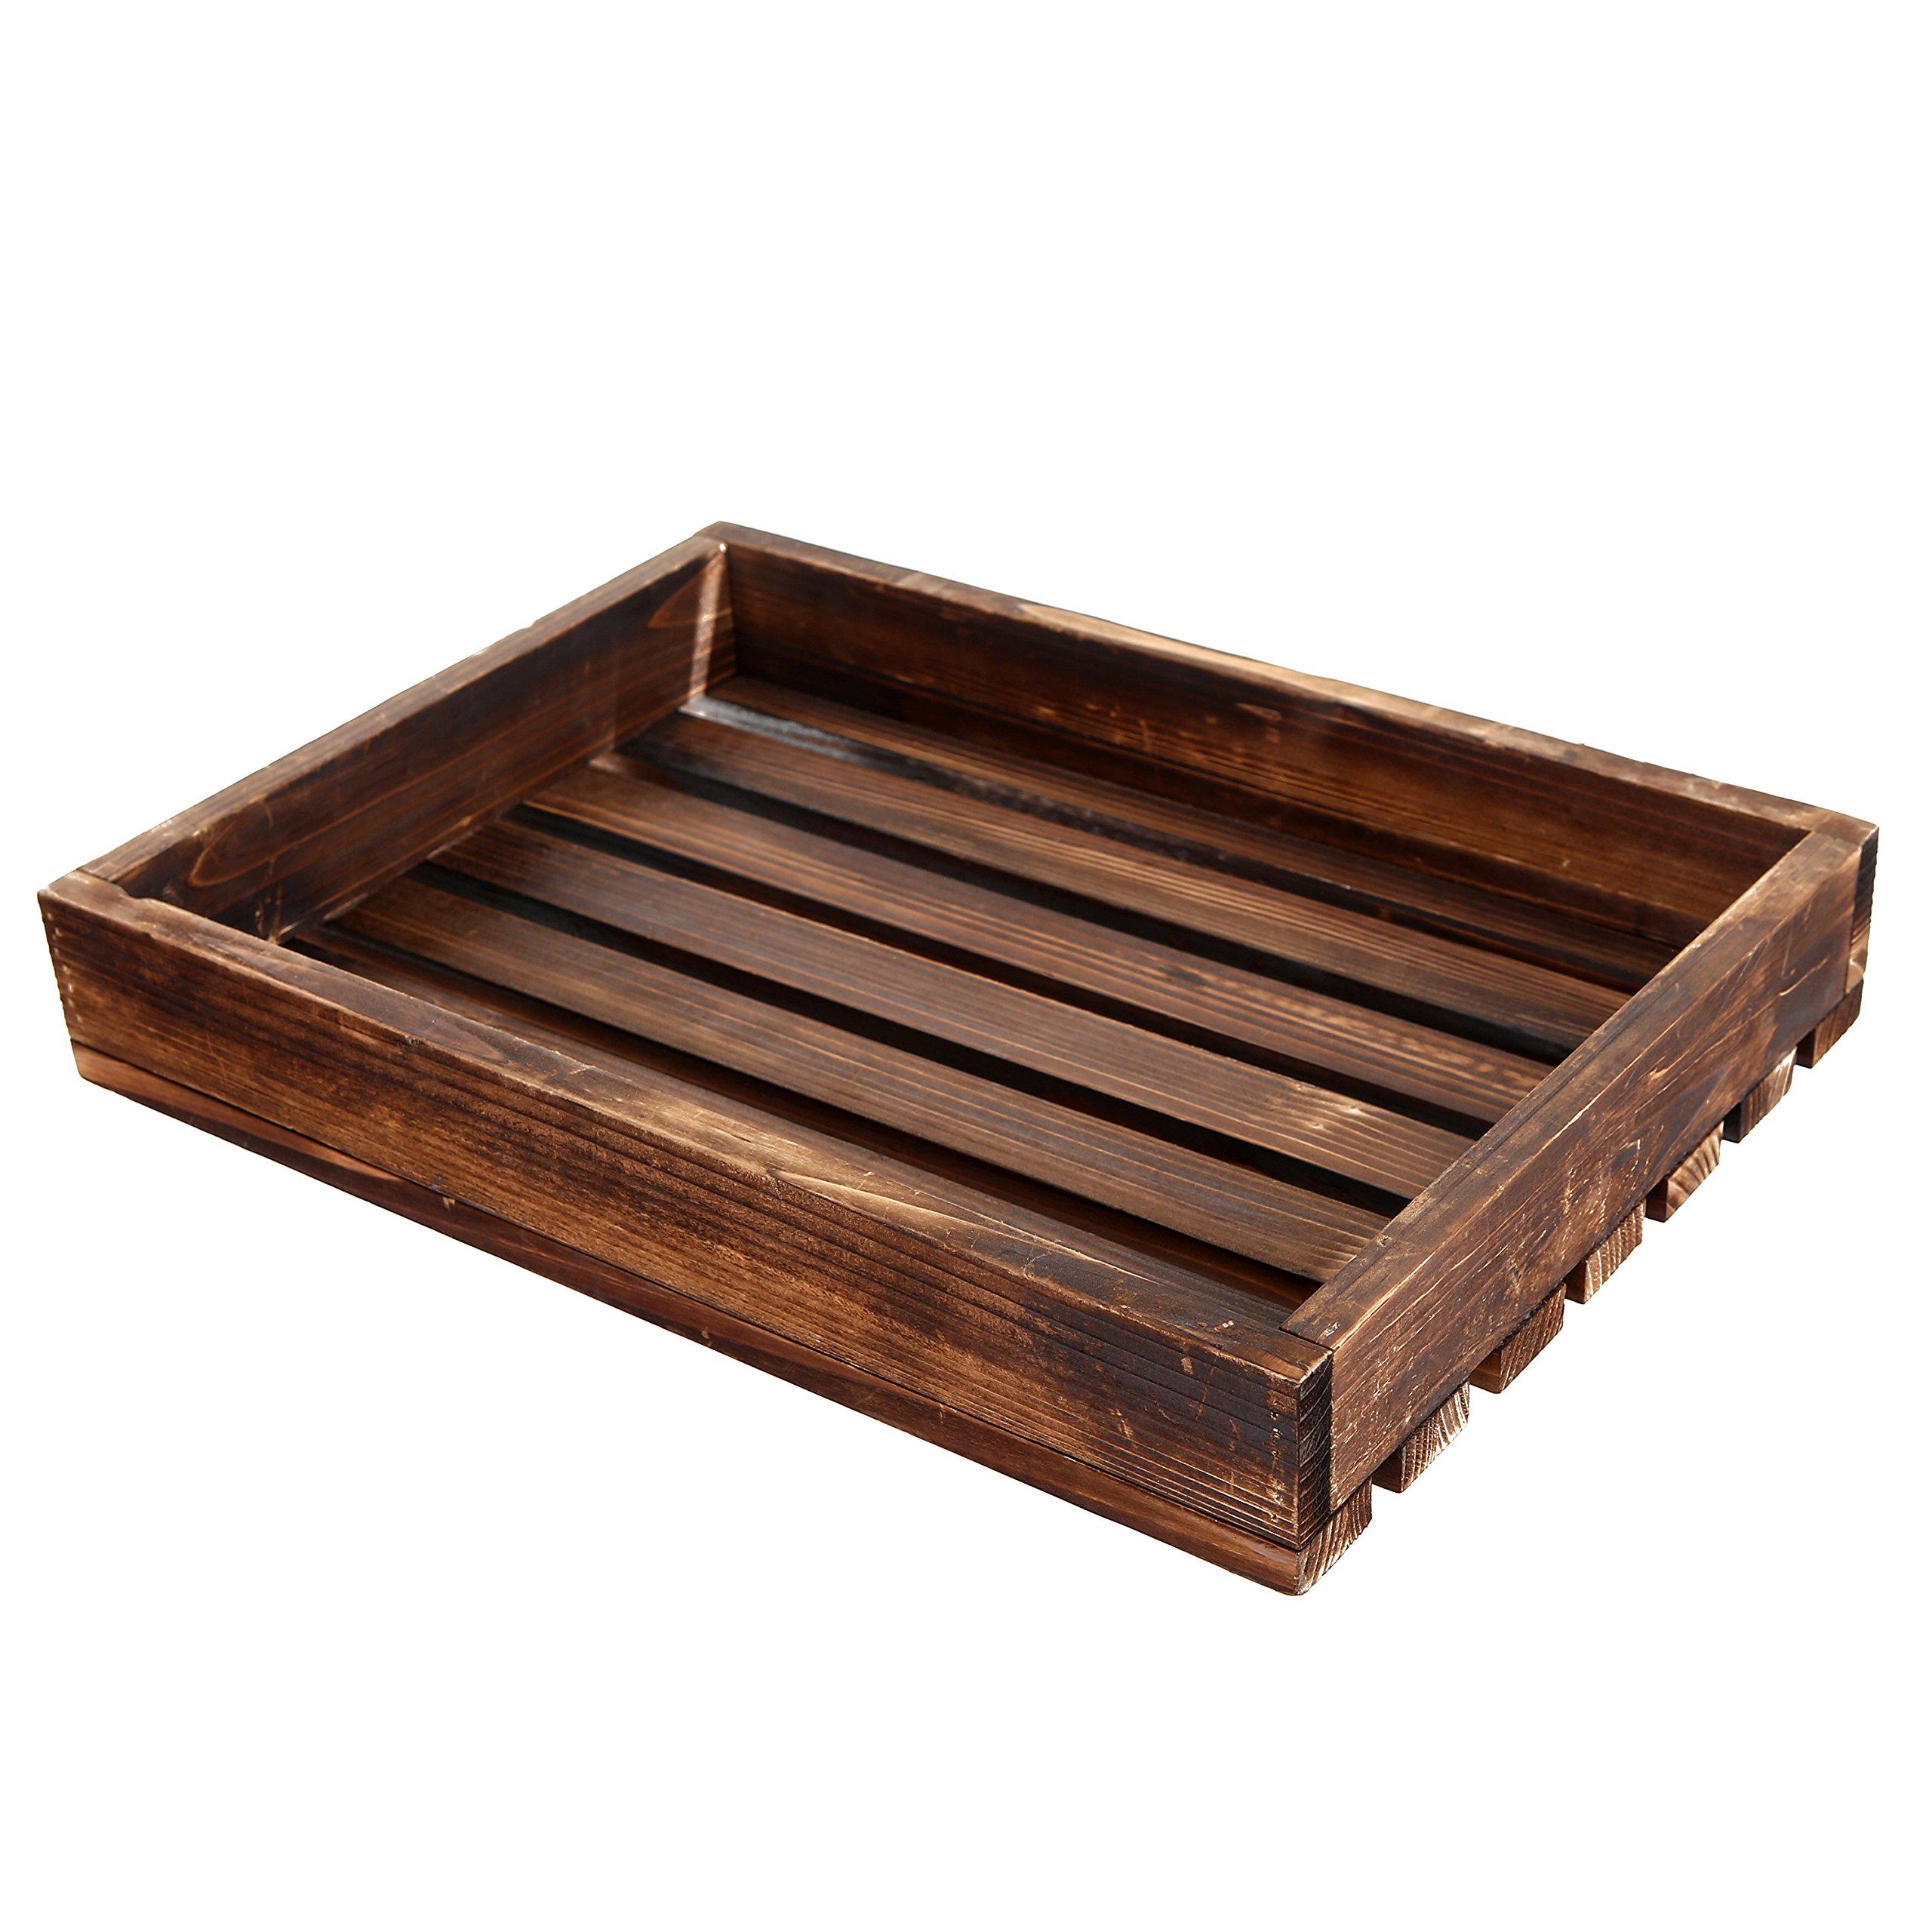 Country Rustic Style Wood Slat Breakfast Serving Tray, Rectangular Display Stand, Dark Brown